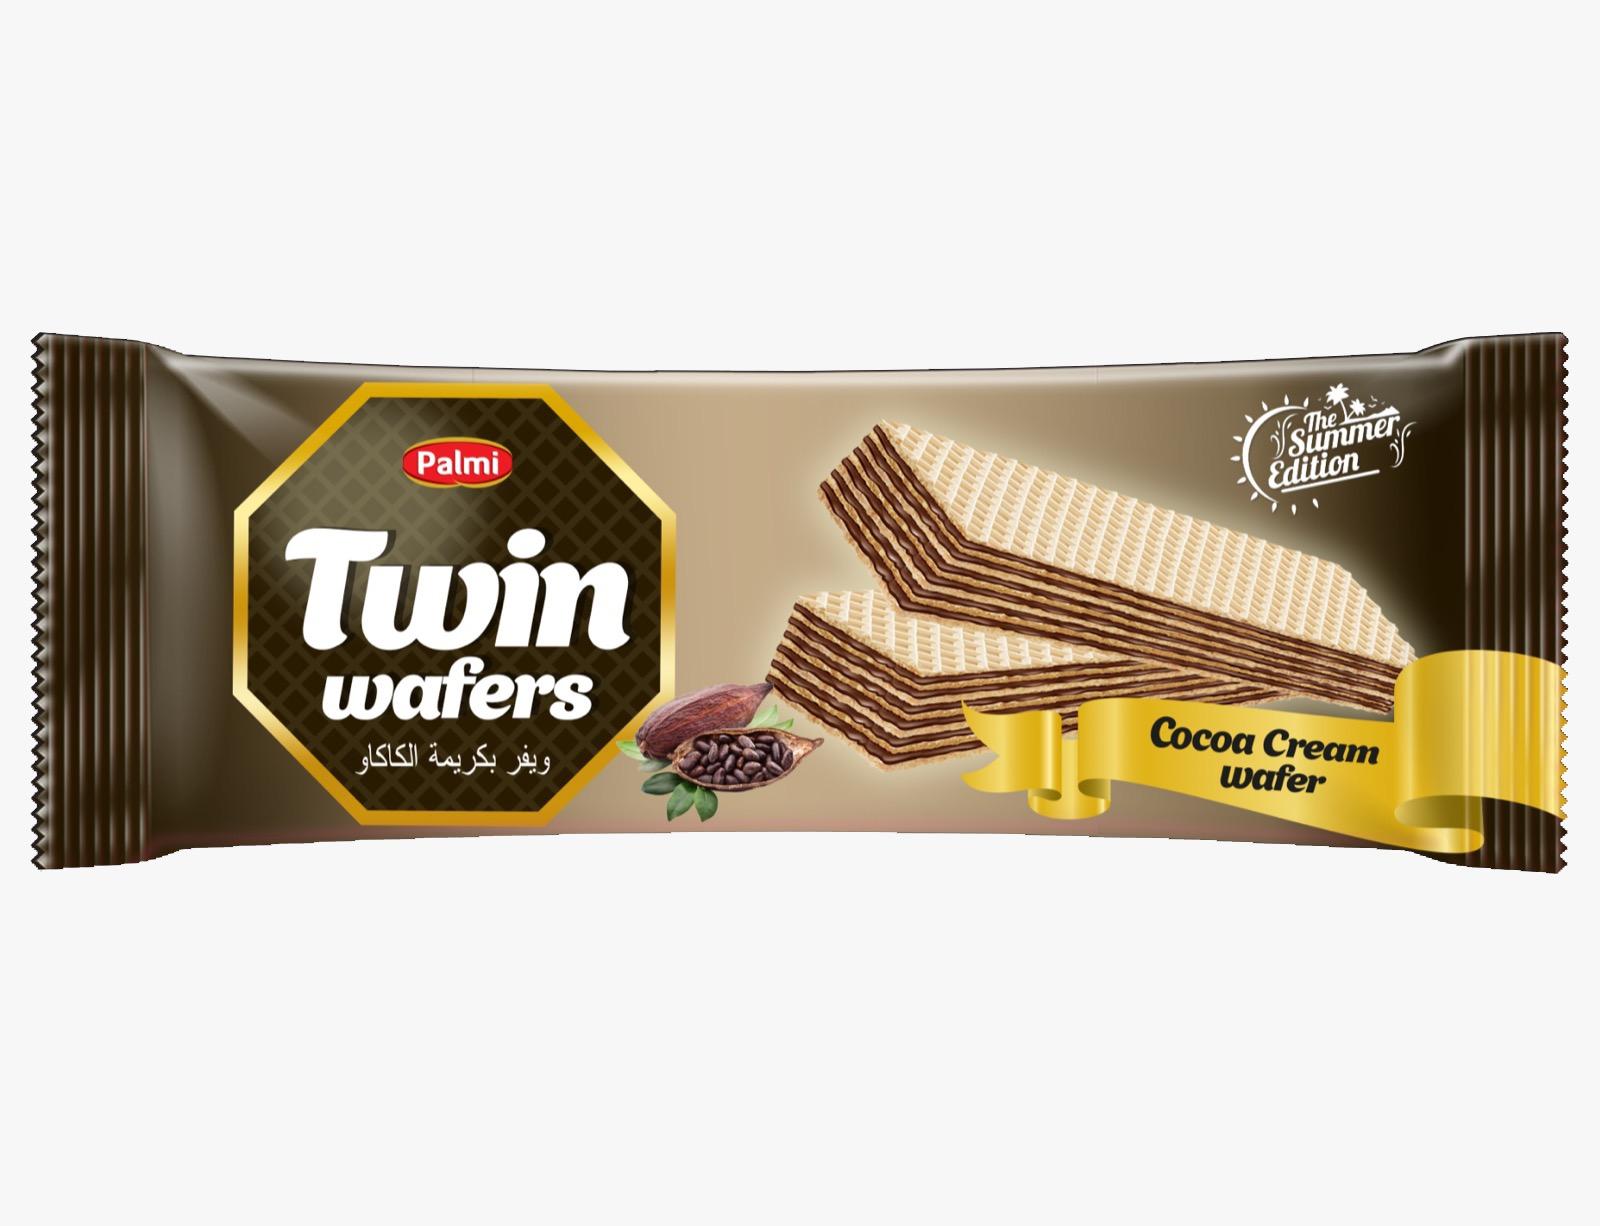 627 - Twin Wafers